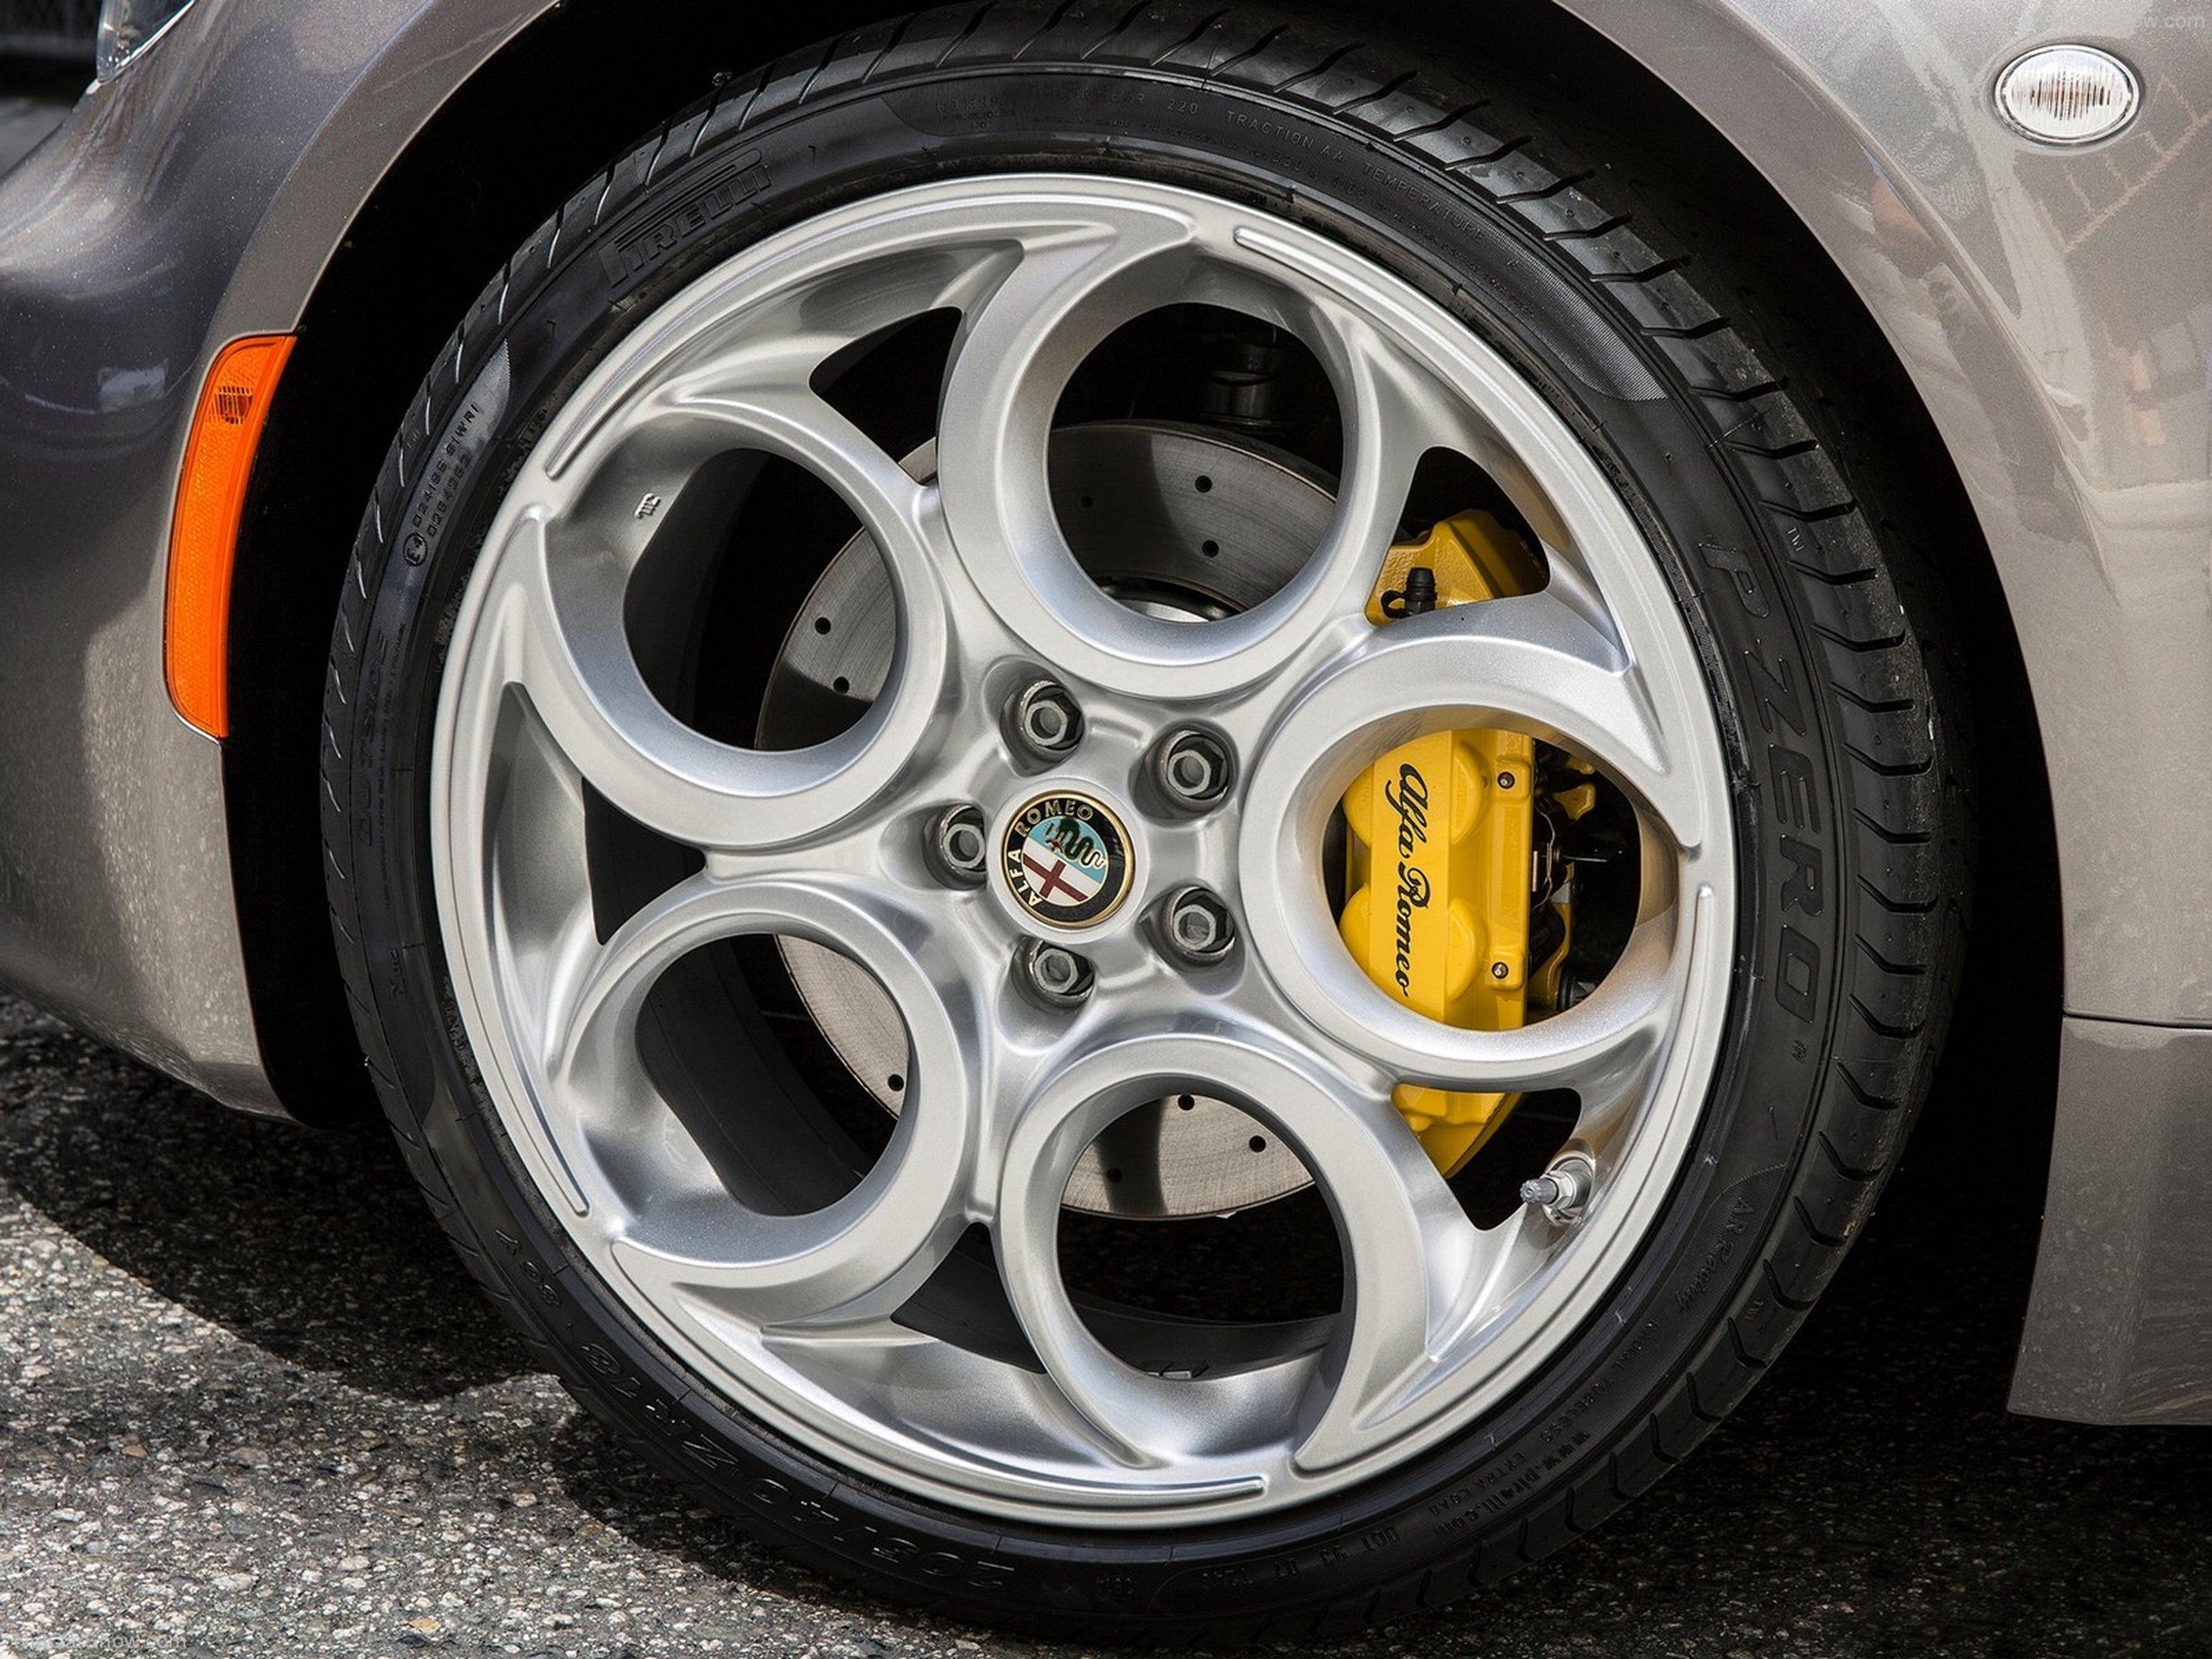 Alfa romeo 147 gta wheel size 15